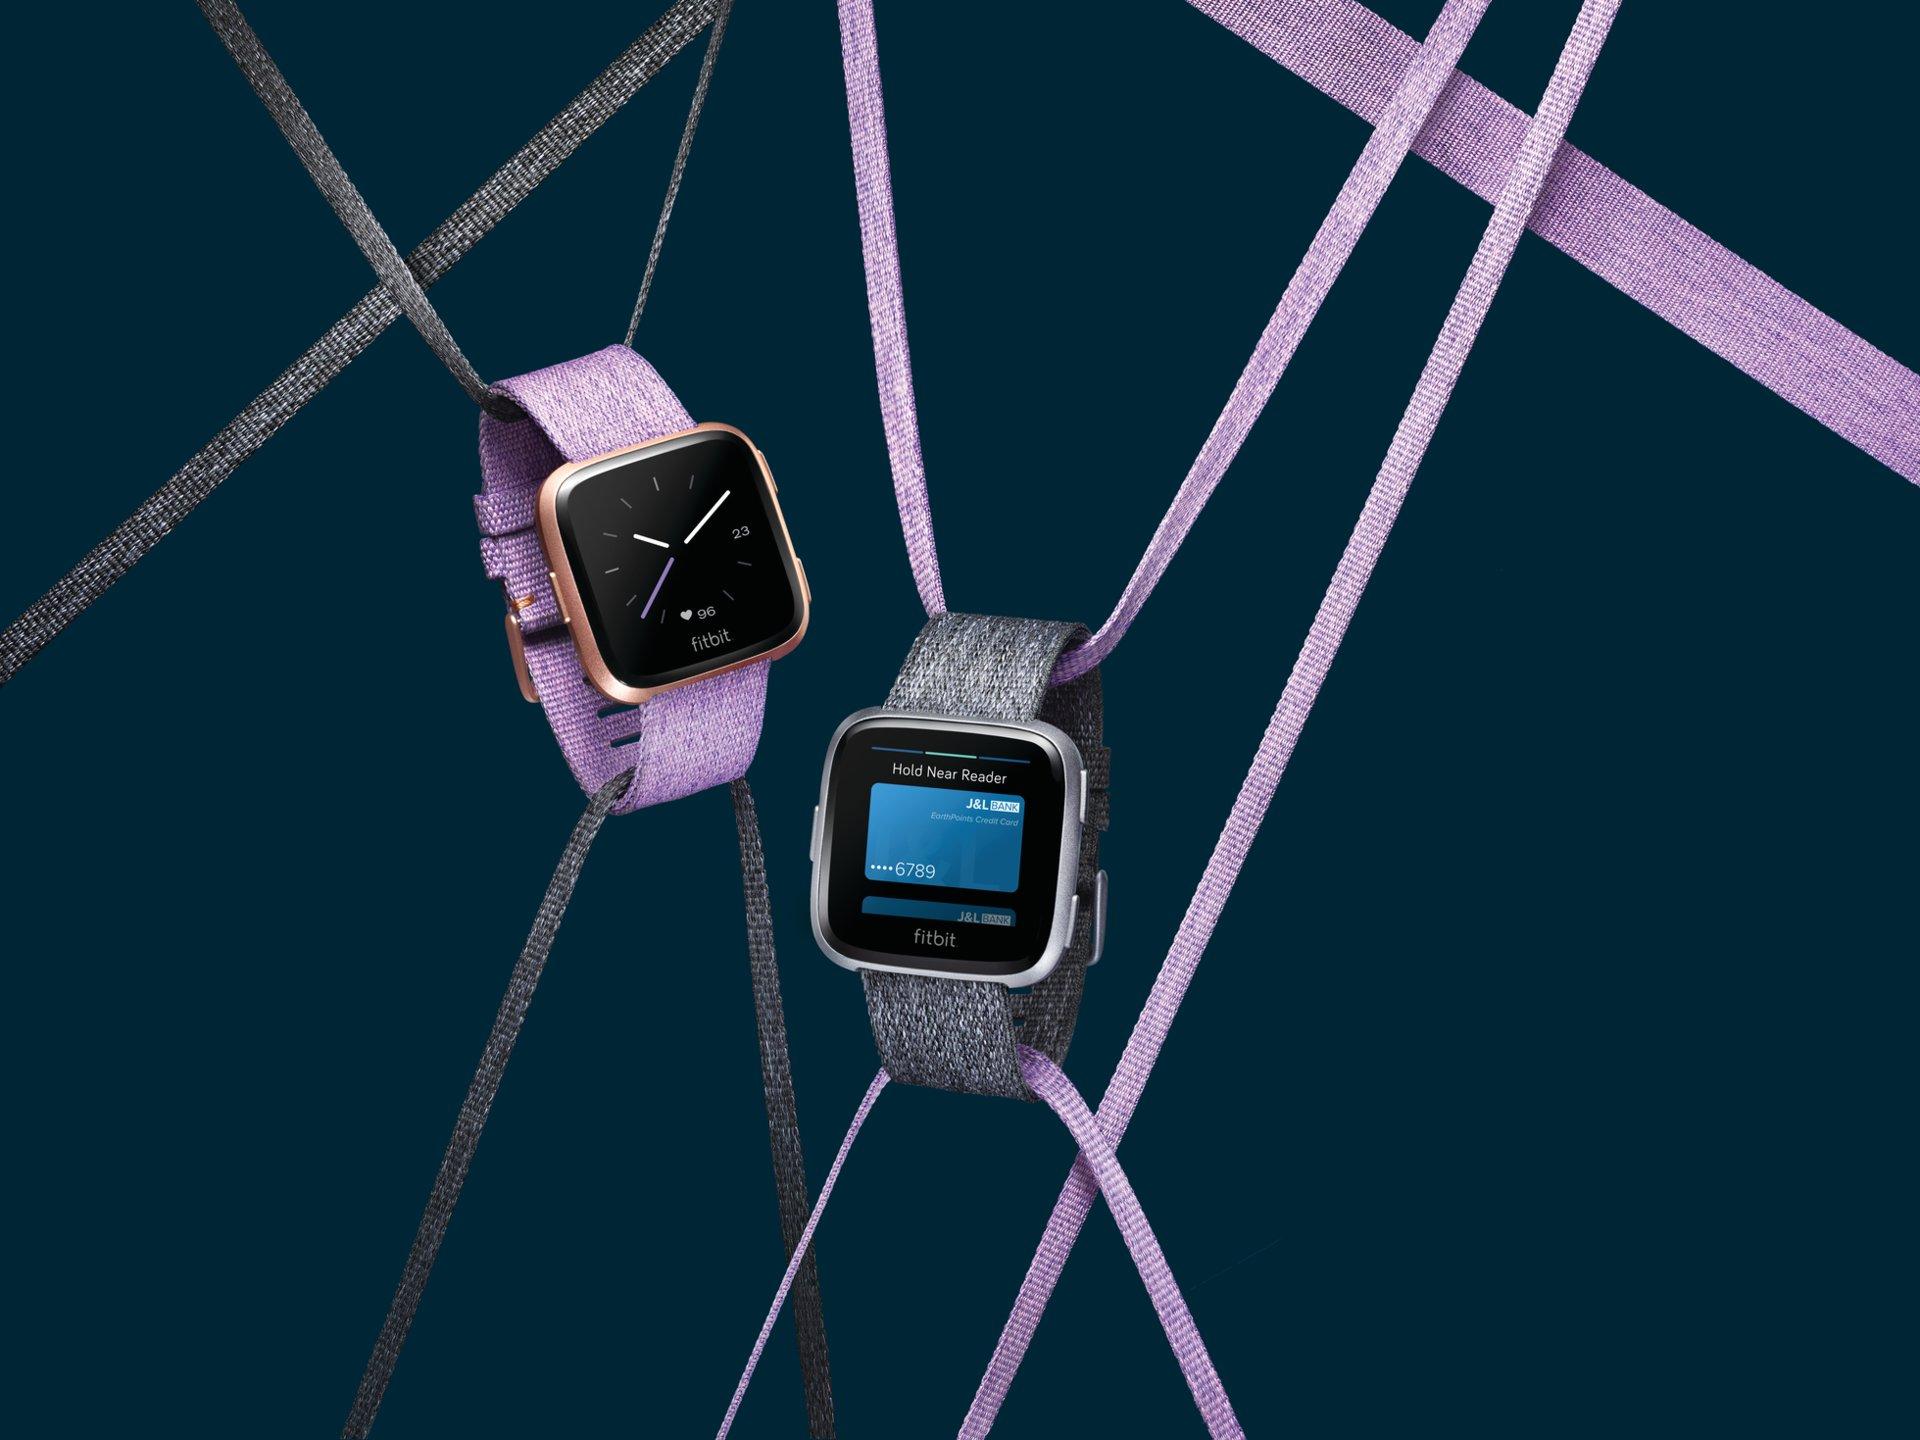 8 reasons to buy smart watch Apple Watch Fitbit instead